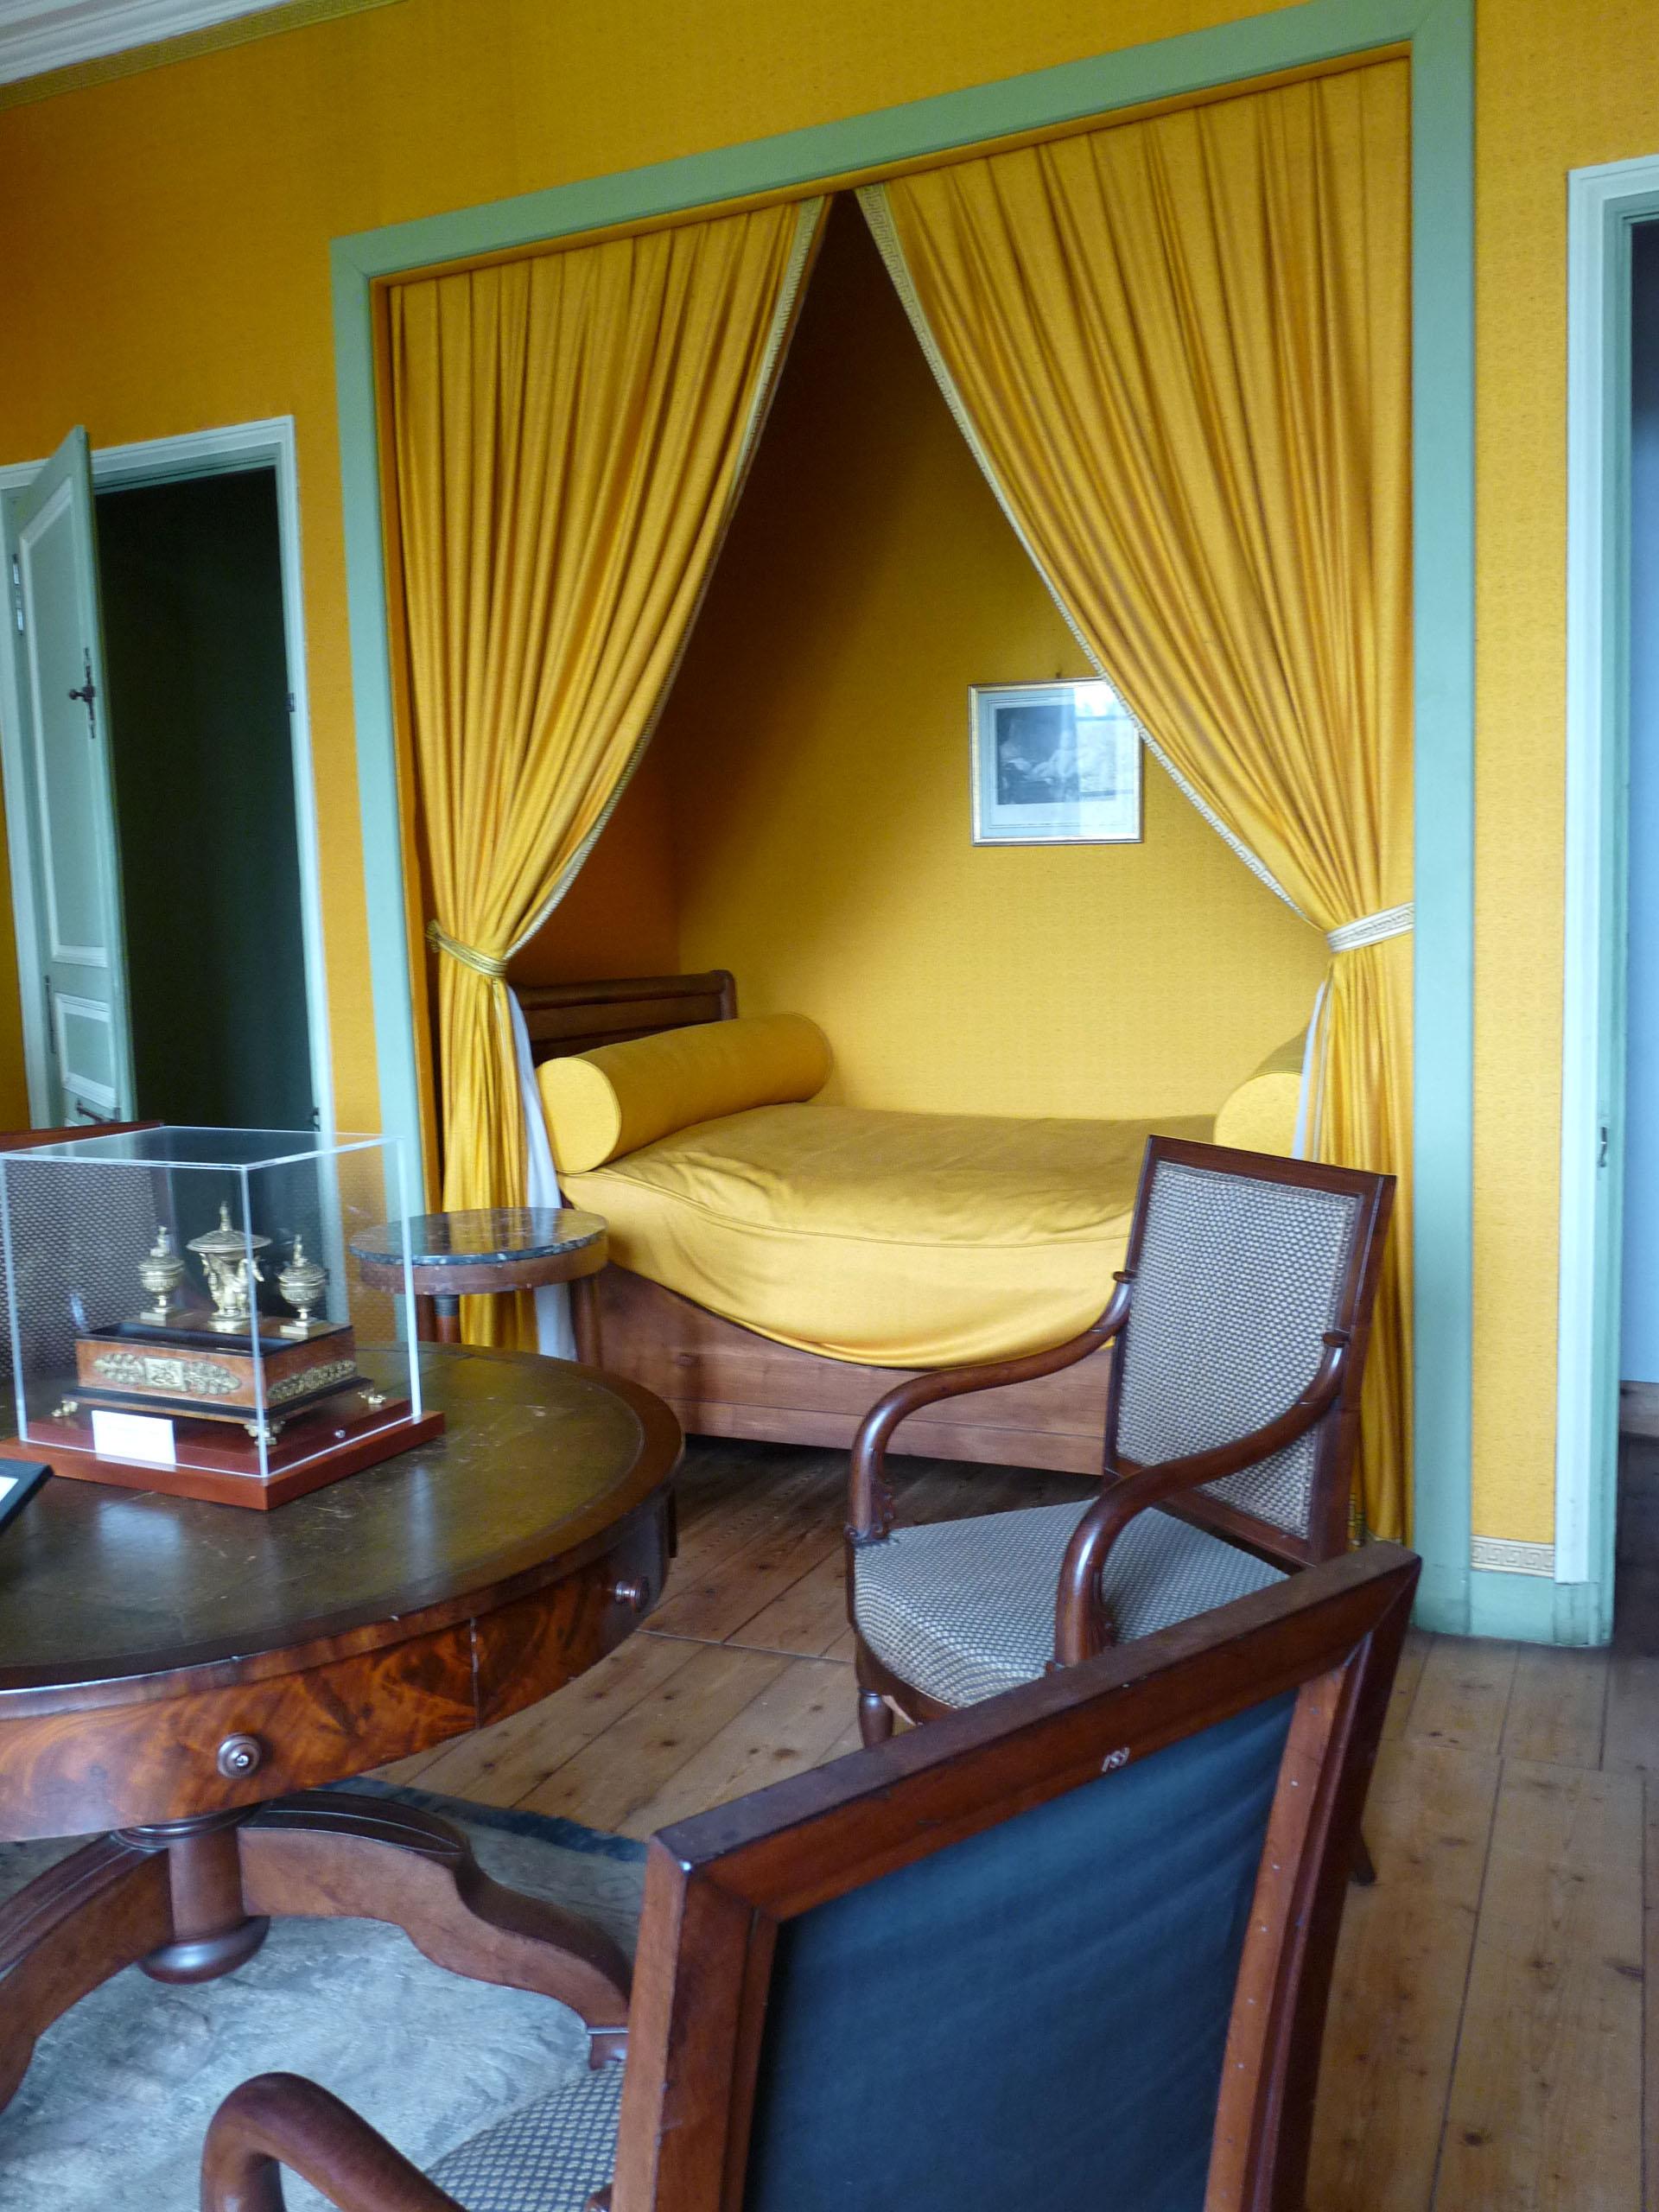 file chambre de napol on ile d 39 wikimedia commons. Black Bedroom Furniture Sets. Home Design Ideas